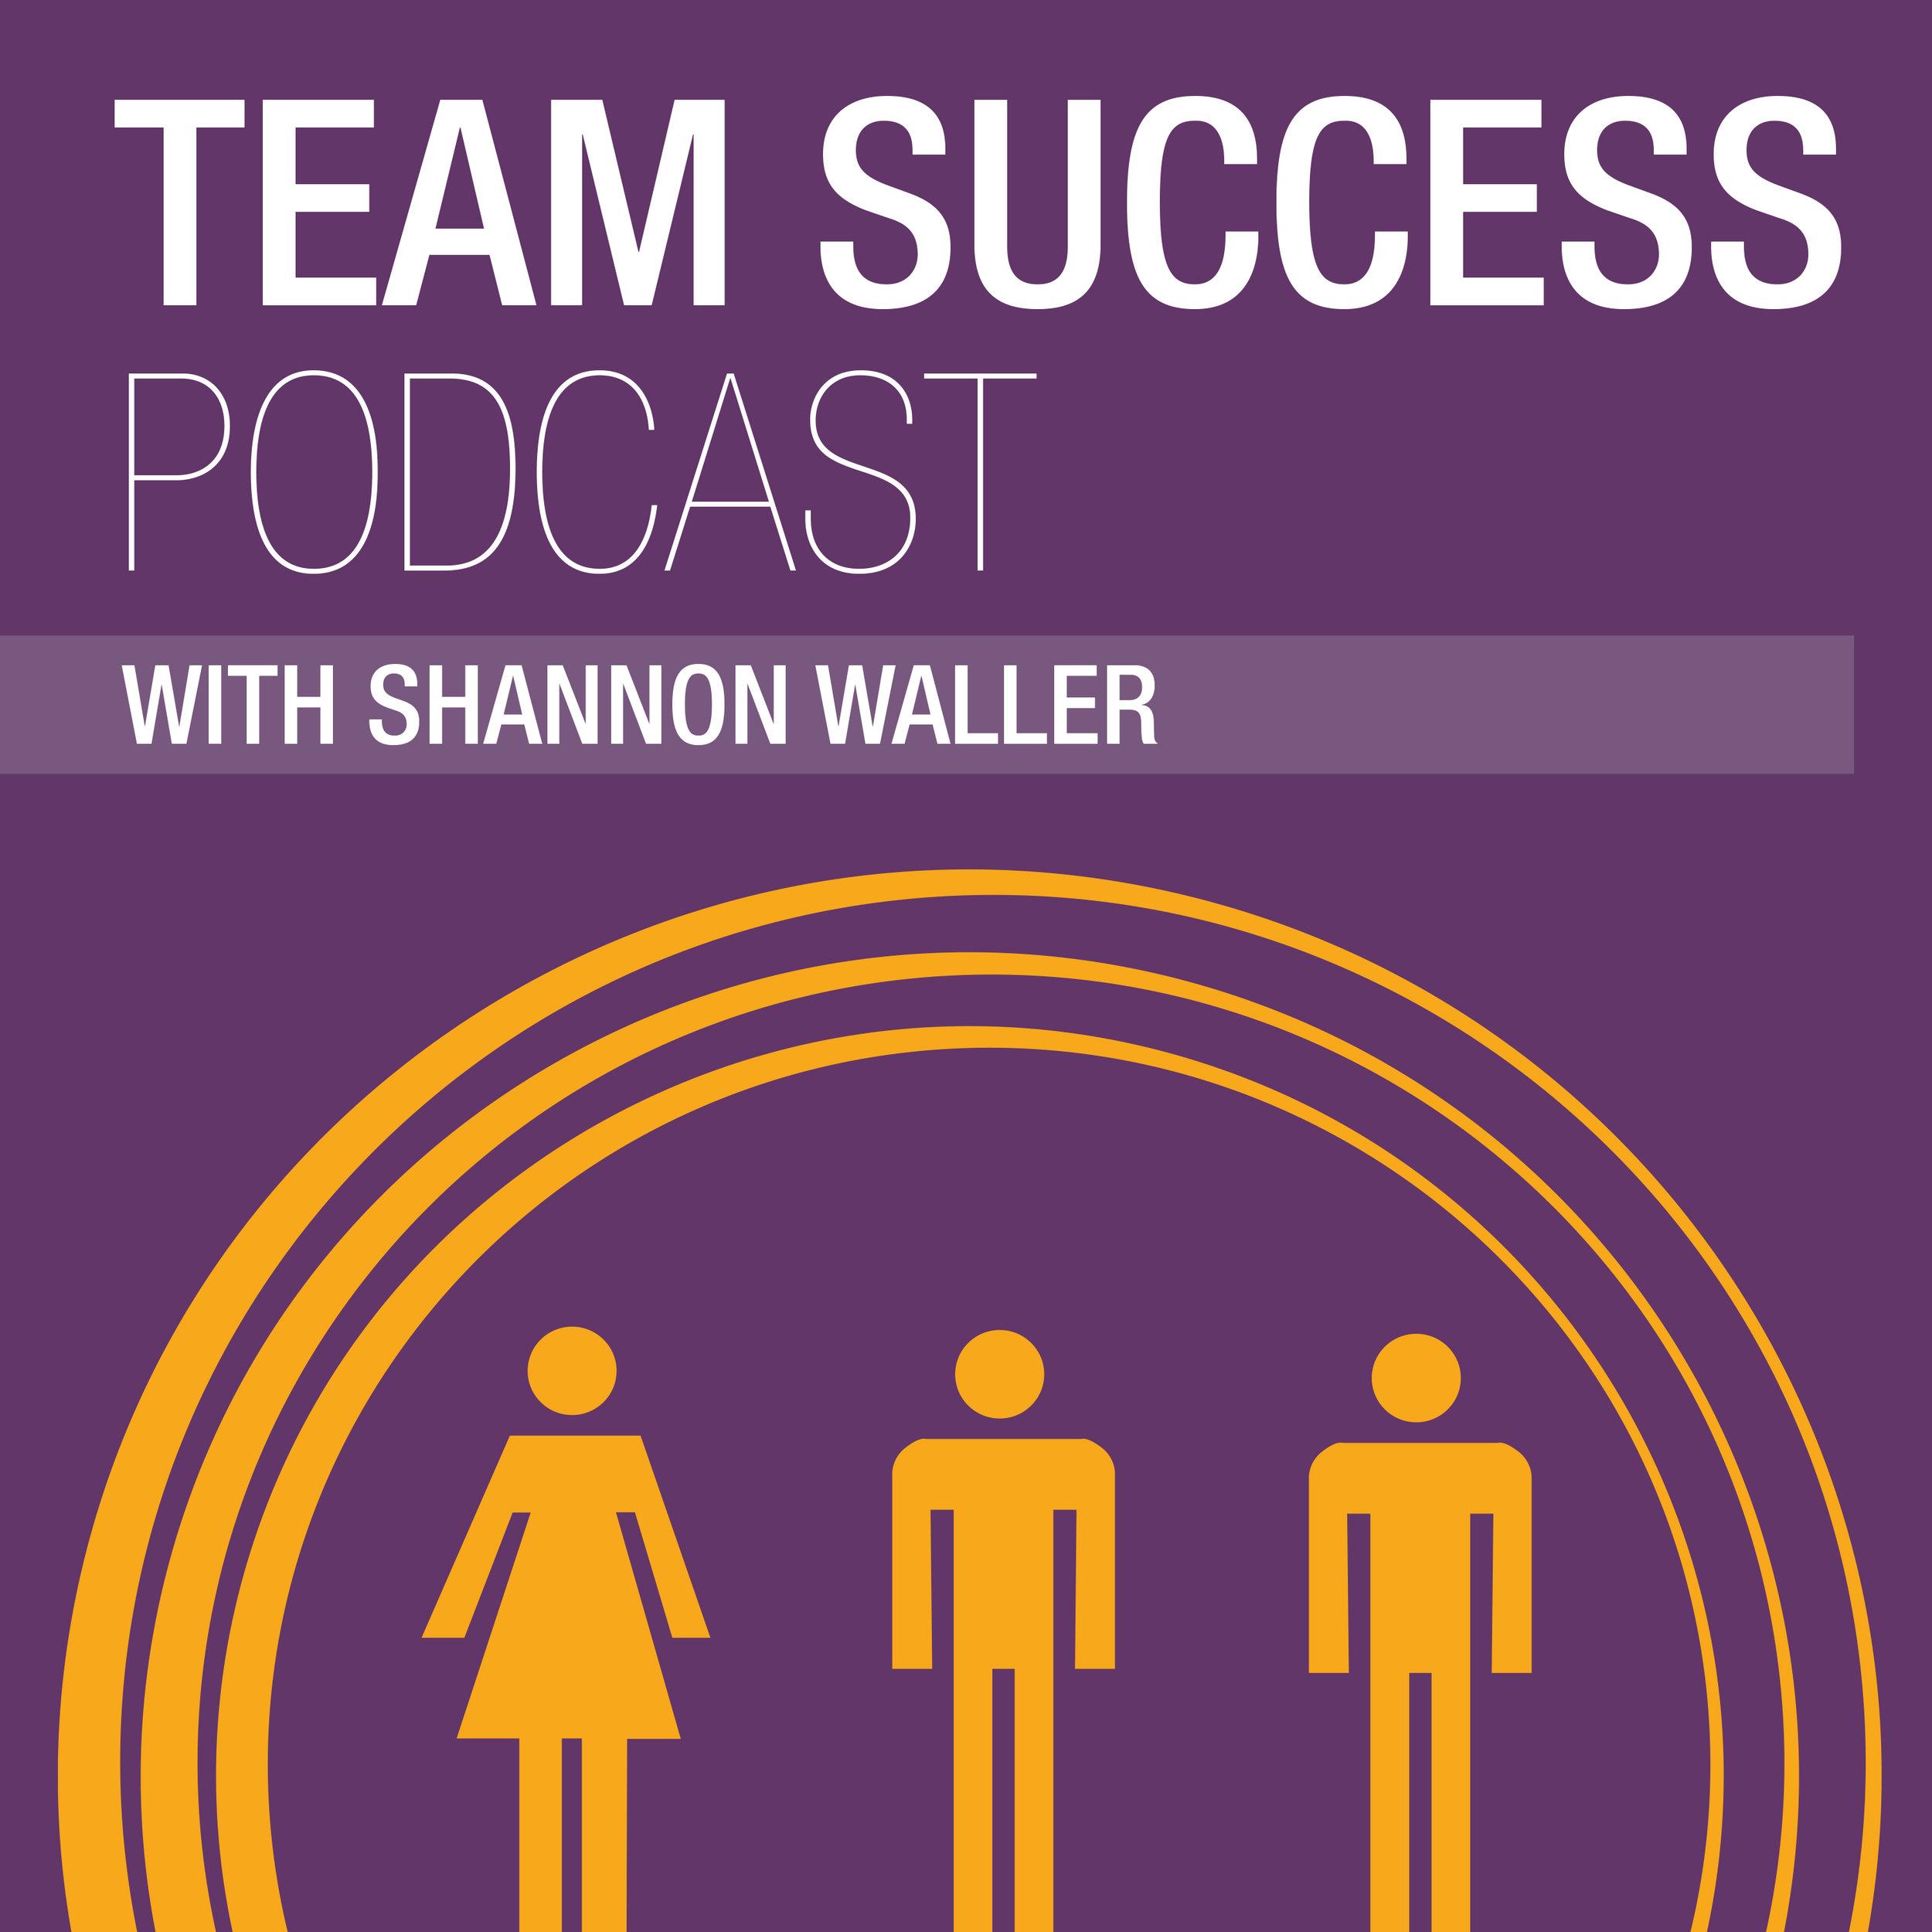 TeamSuccessPodcast_iTunesCoverart_ITUNES_3000x3000-338.jpg